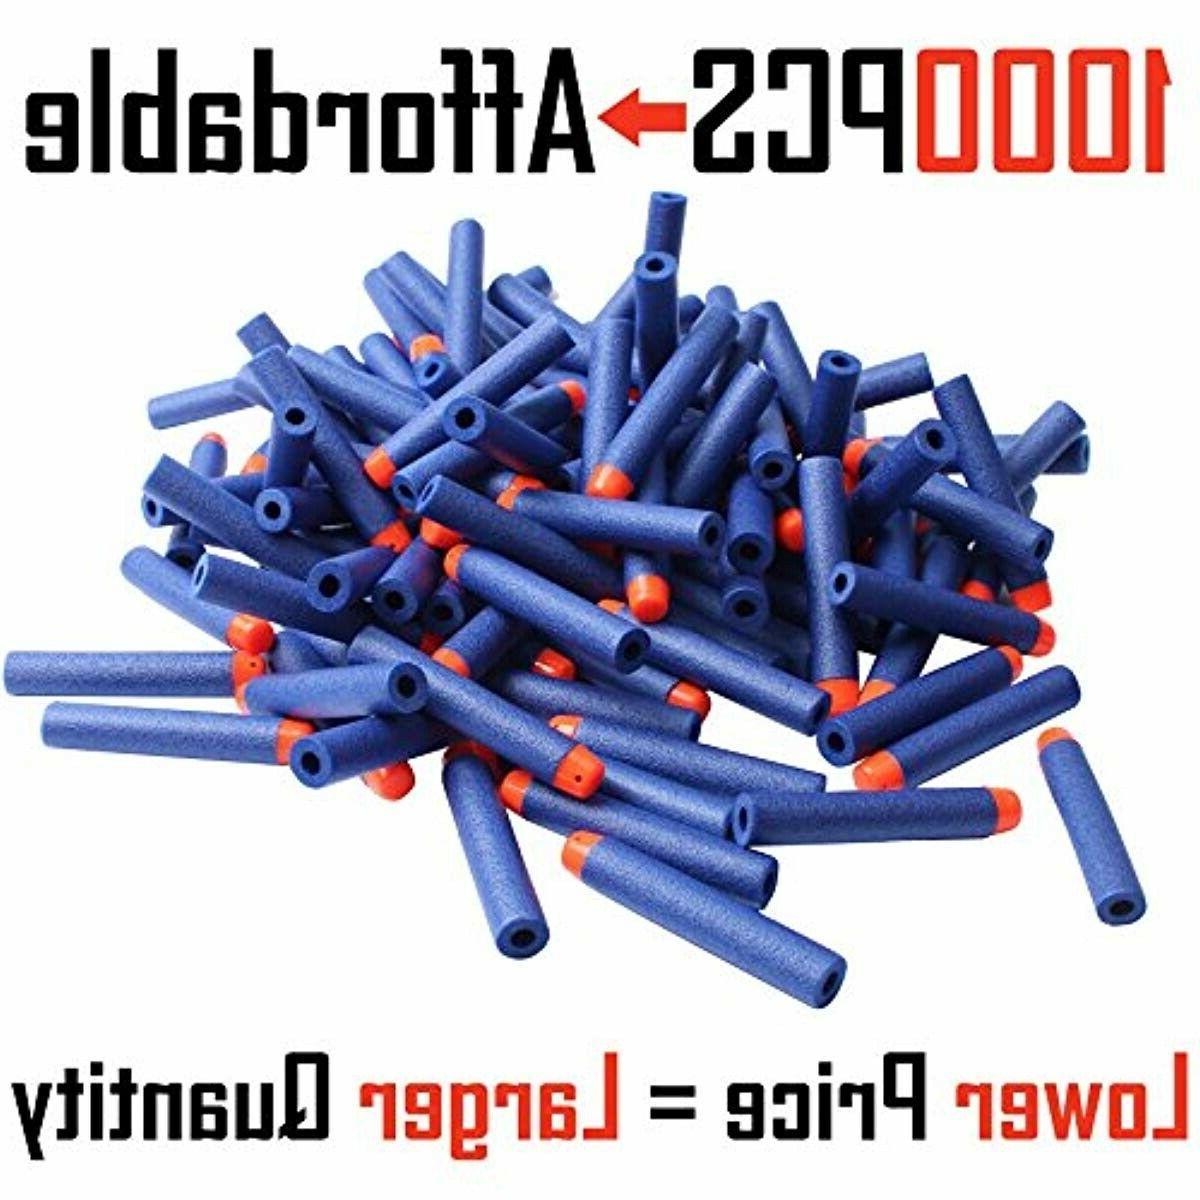 Refill 1000PCS Bulk Bullets Nerf Elite Series, Blue